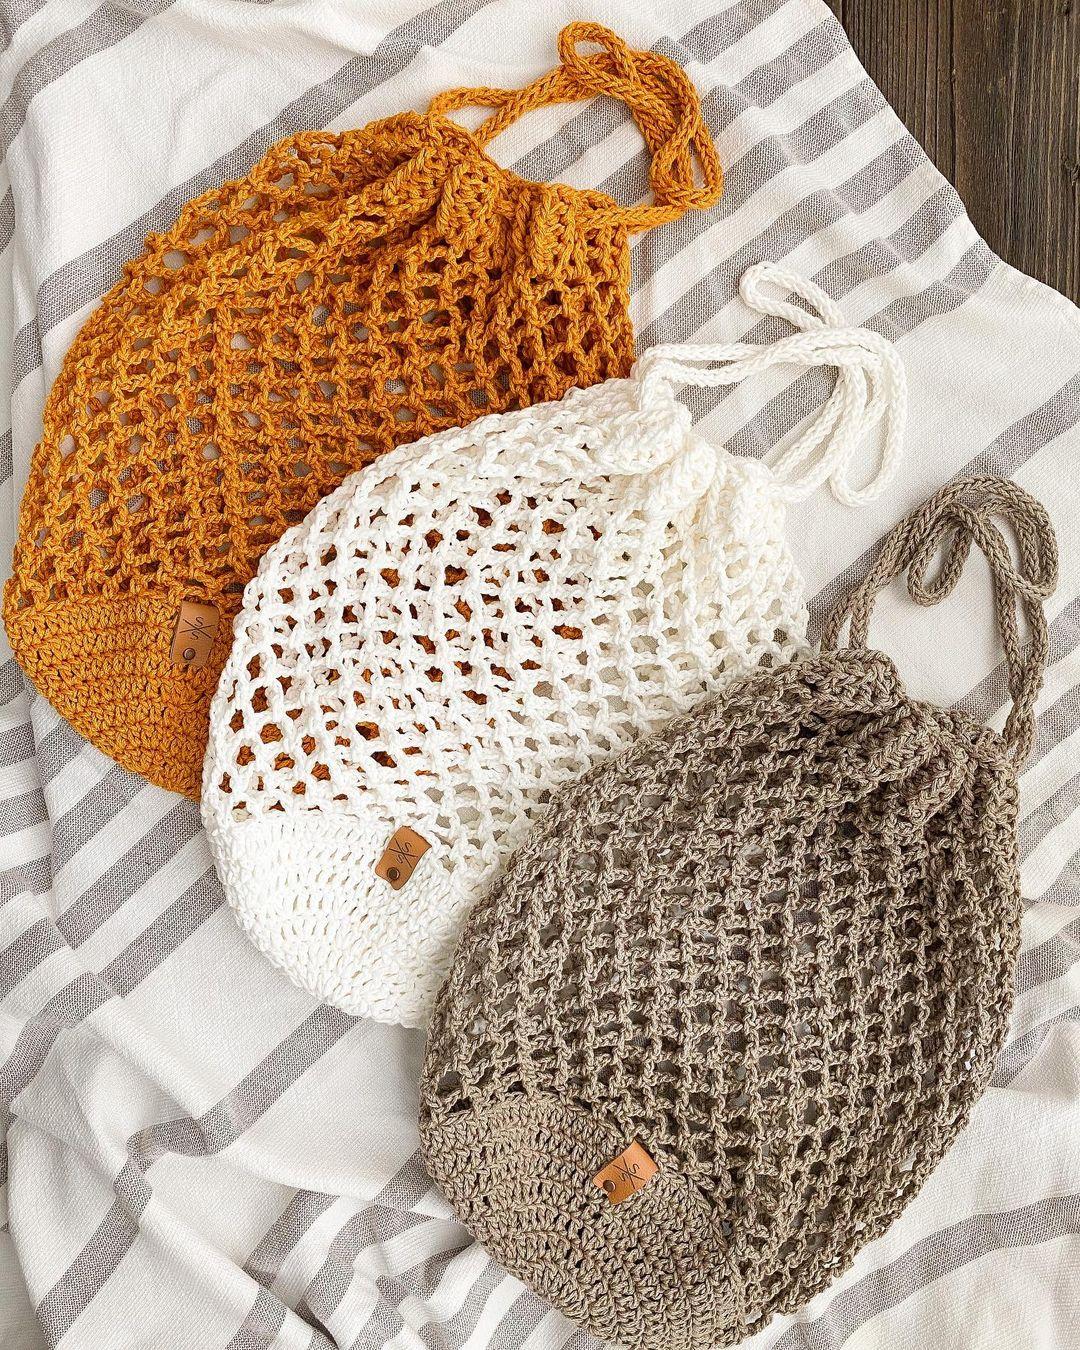 three crochet market bags